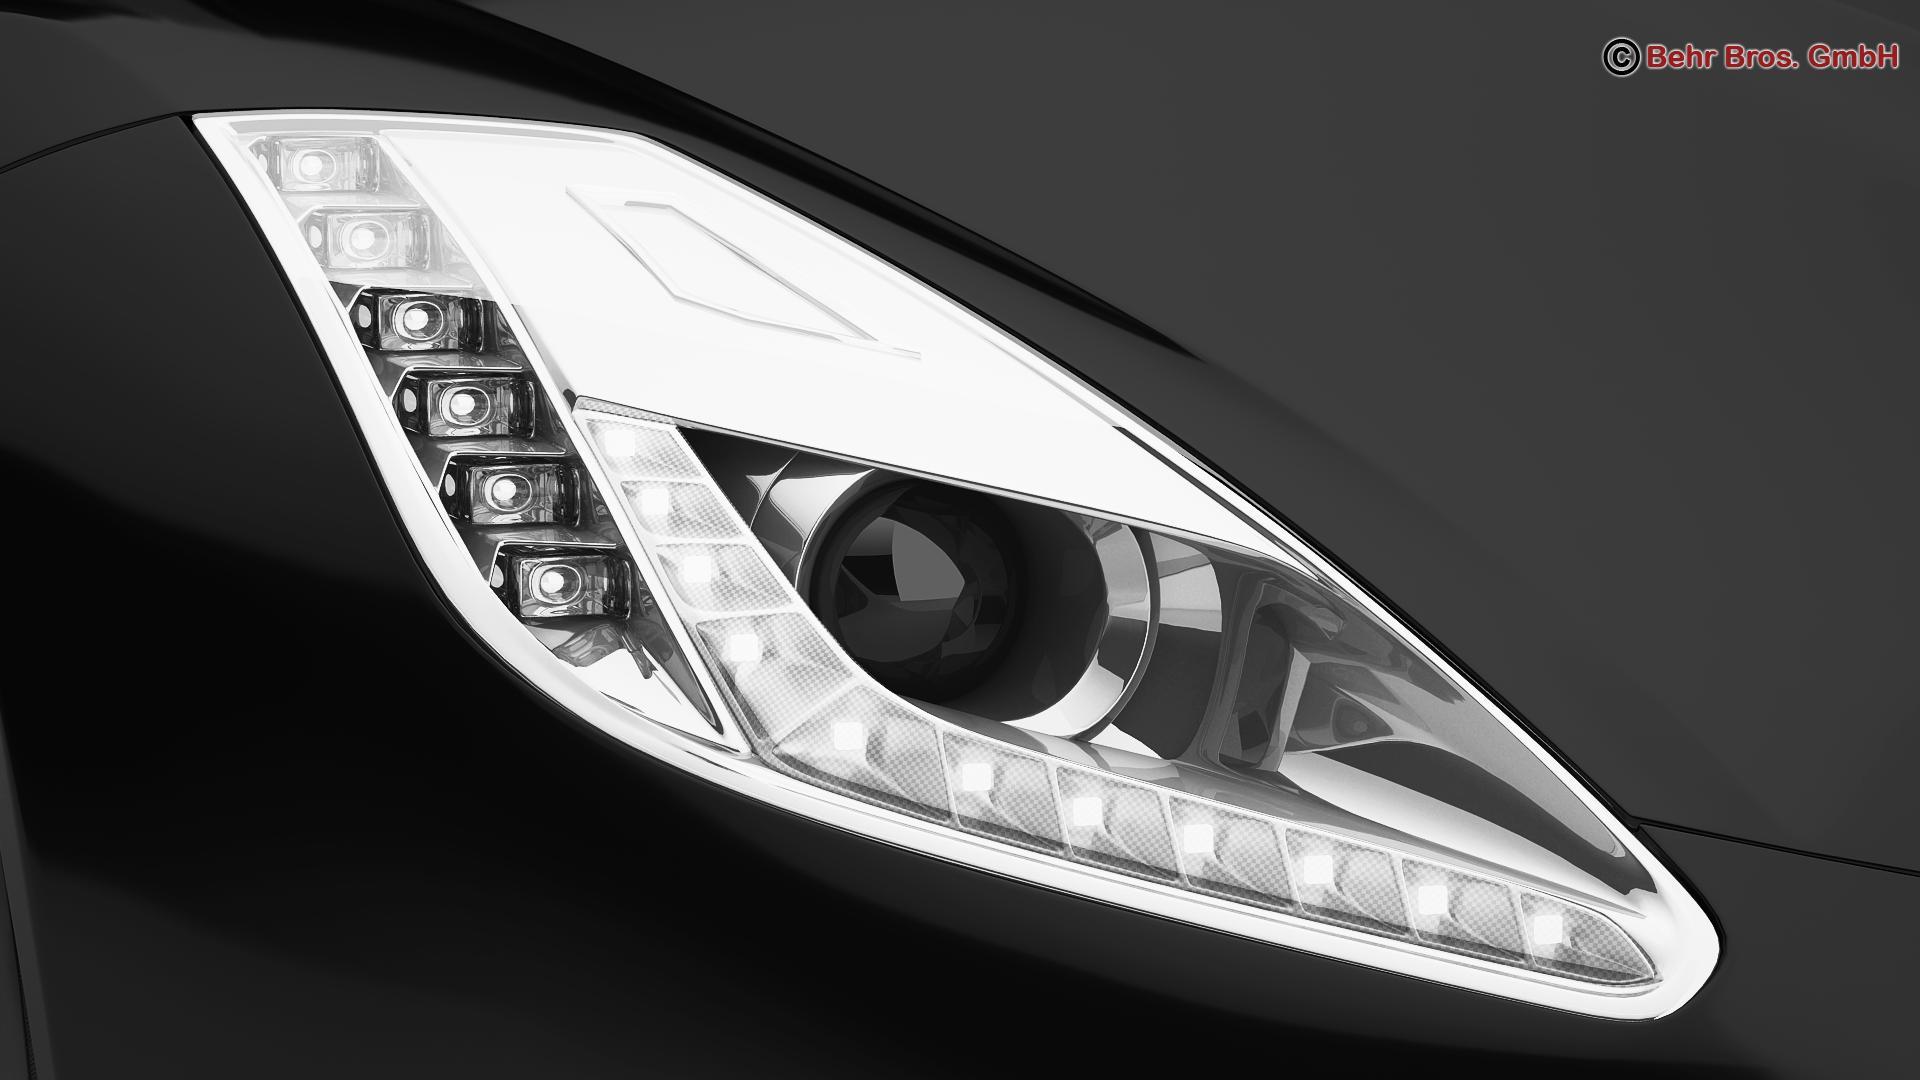 generic sports car 3d model 3ds max fbx c4d lwo ma mb obj 160530